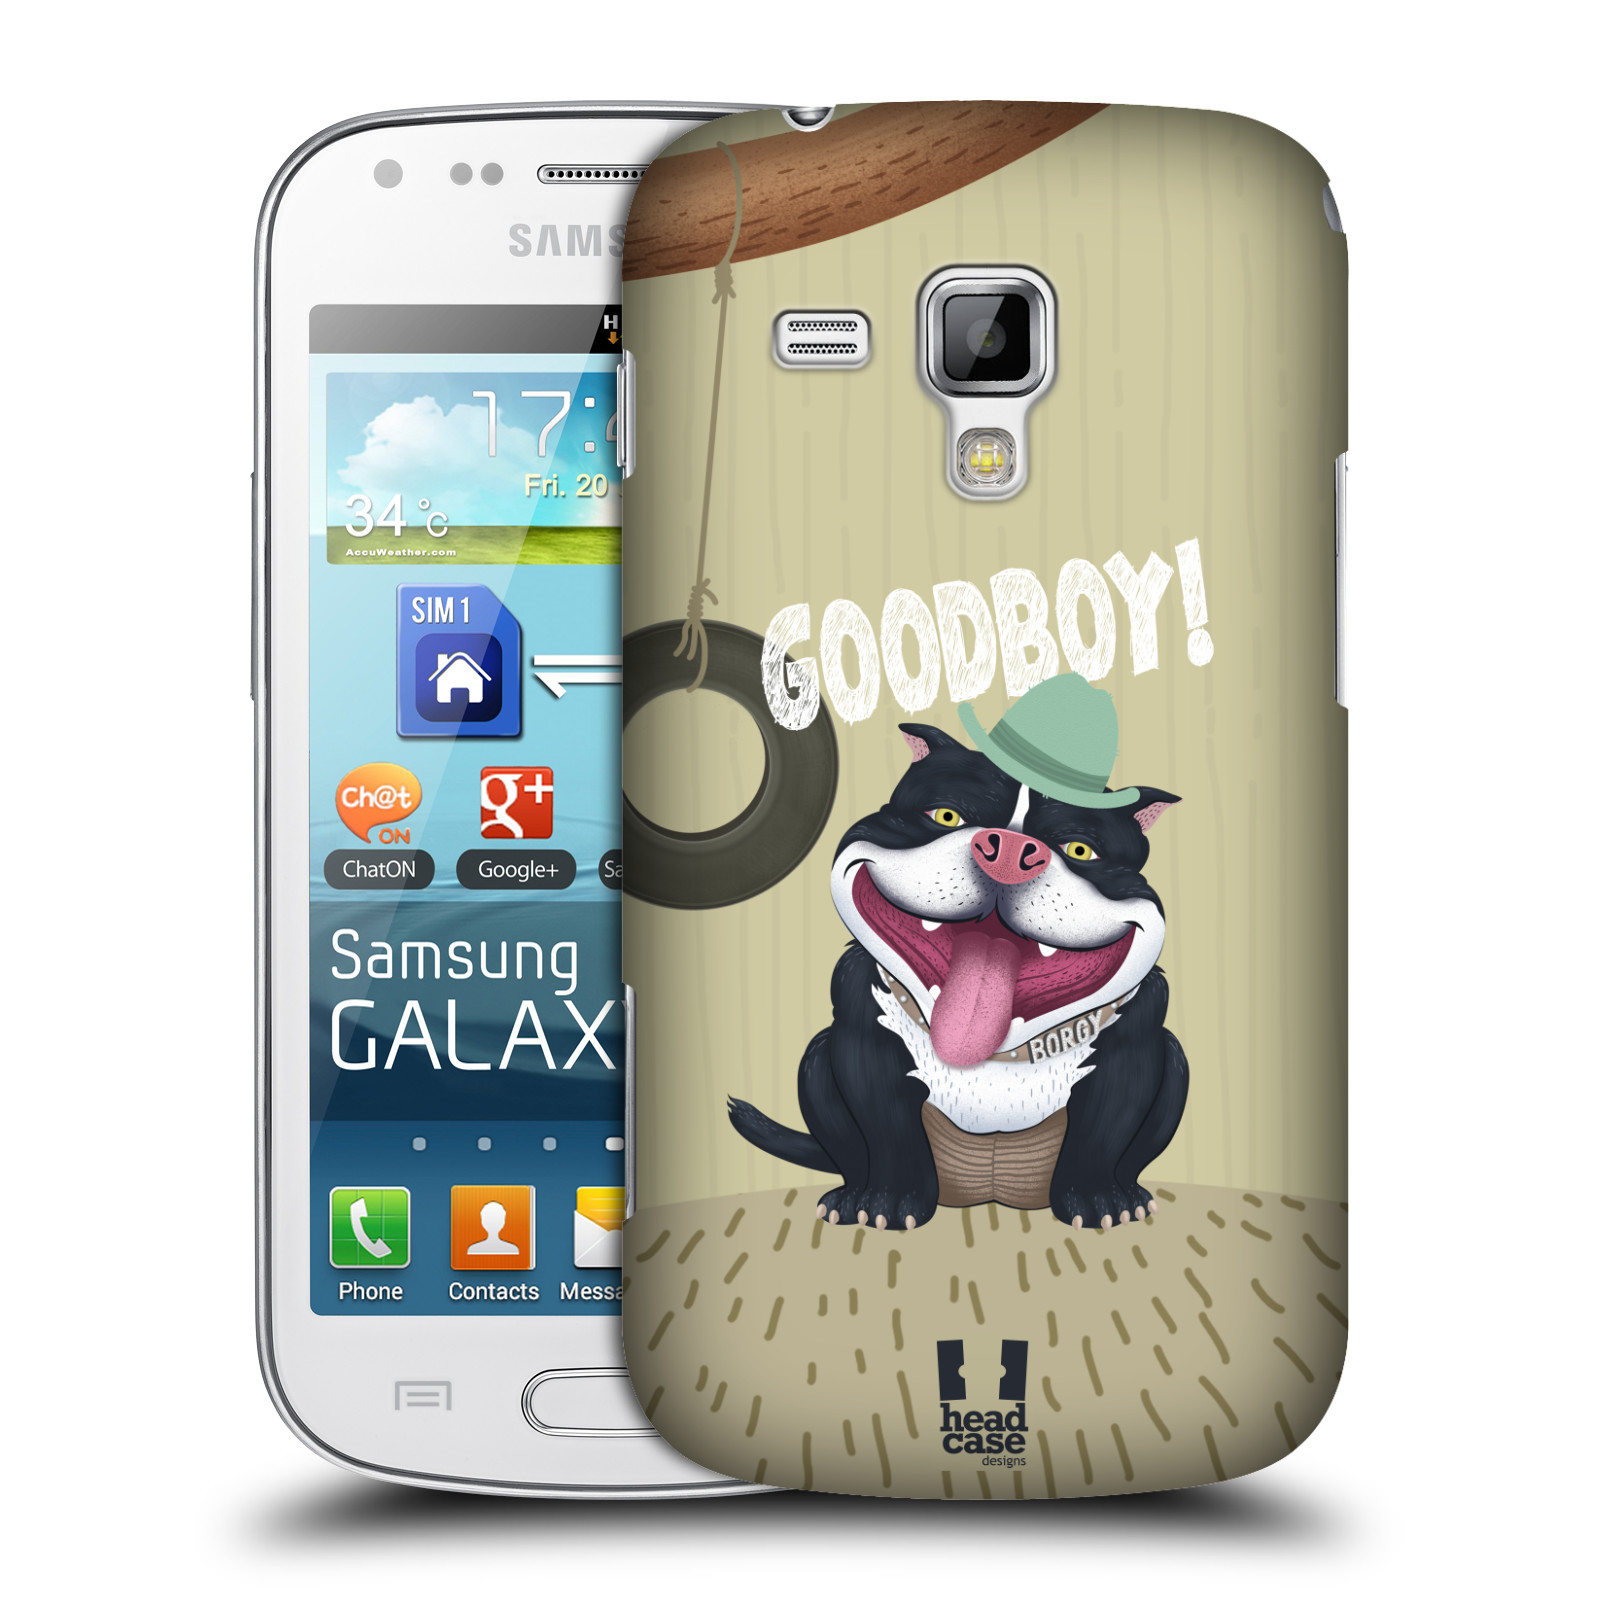 Plastové pouzdro na mobil Samsung Galaxy Trend Plus HEAD CASE Goodboy! Pejsek (Kryt či obal na mobilní telefon Samsung Galaxy Trend Plus GT-S7580)